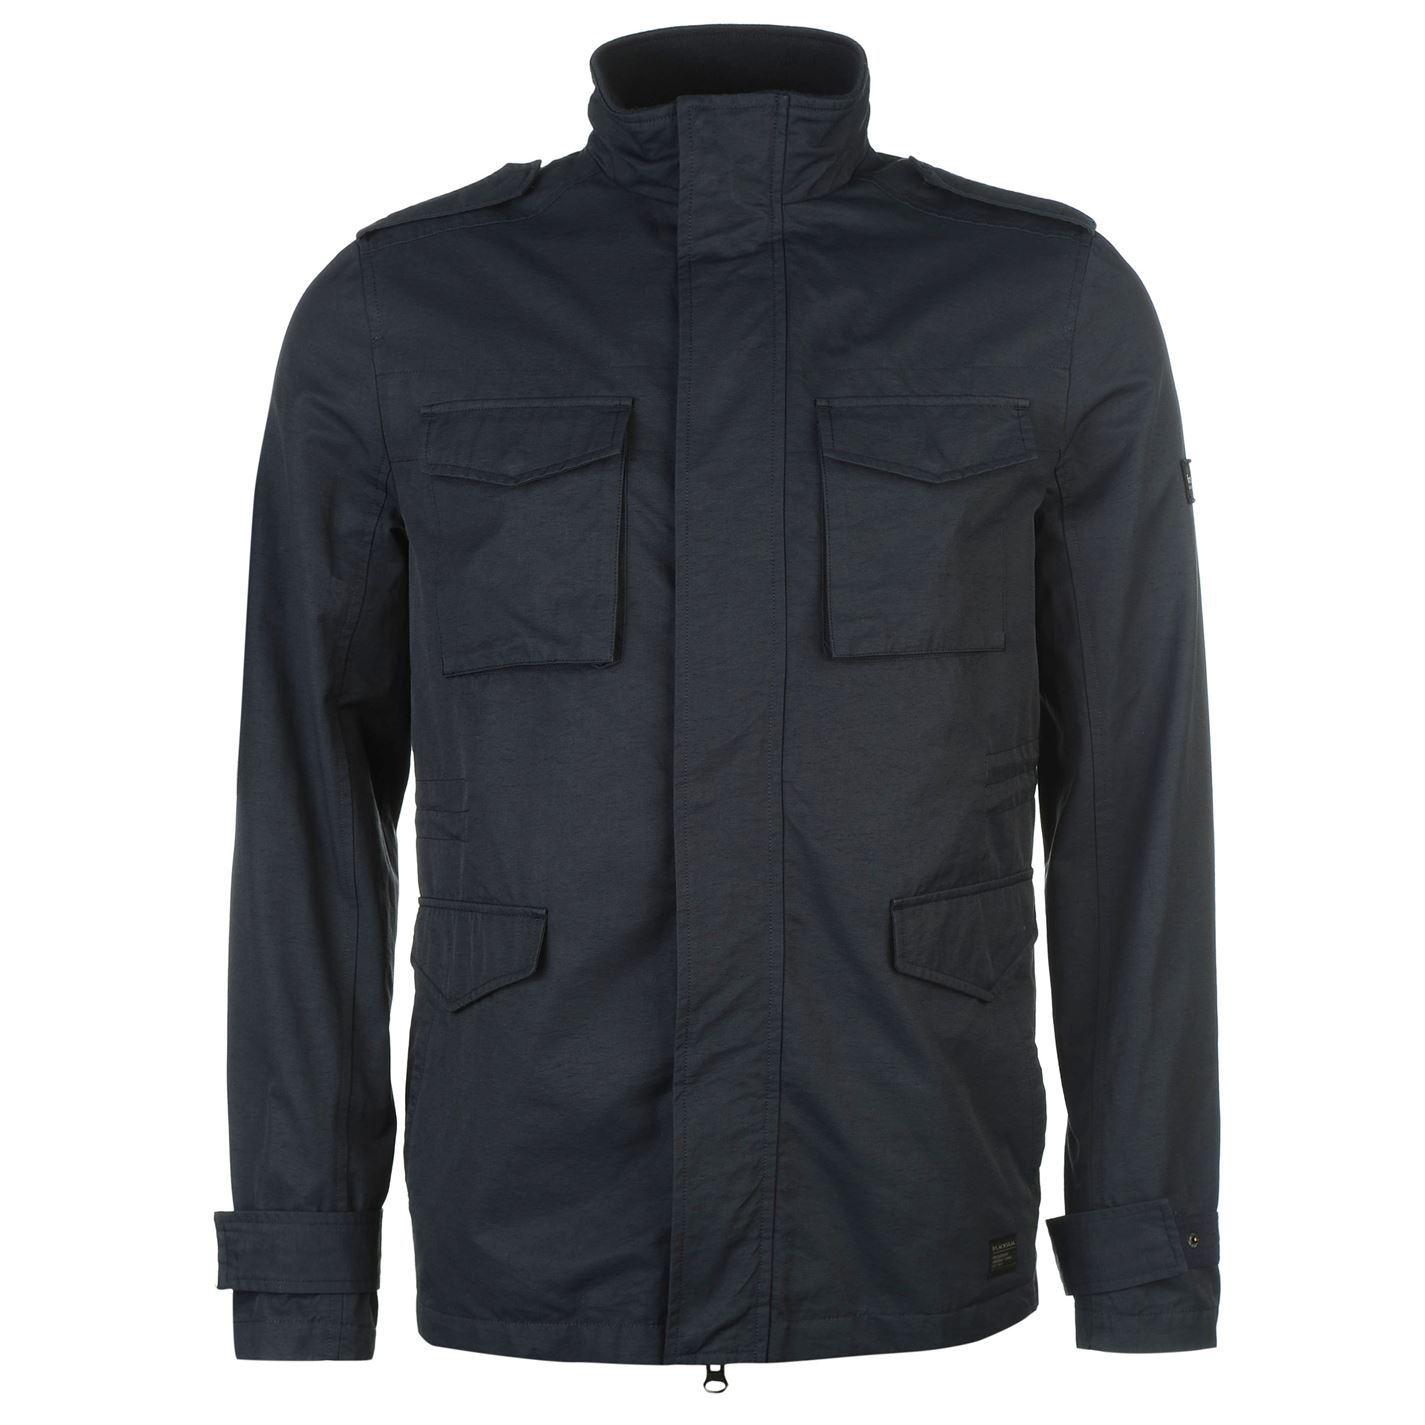 firetrap mens 4 pocket jacket winter warm high neck full zip top #2: 275d8962 2050 4b20 8562 4ac350d3c8be